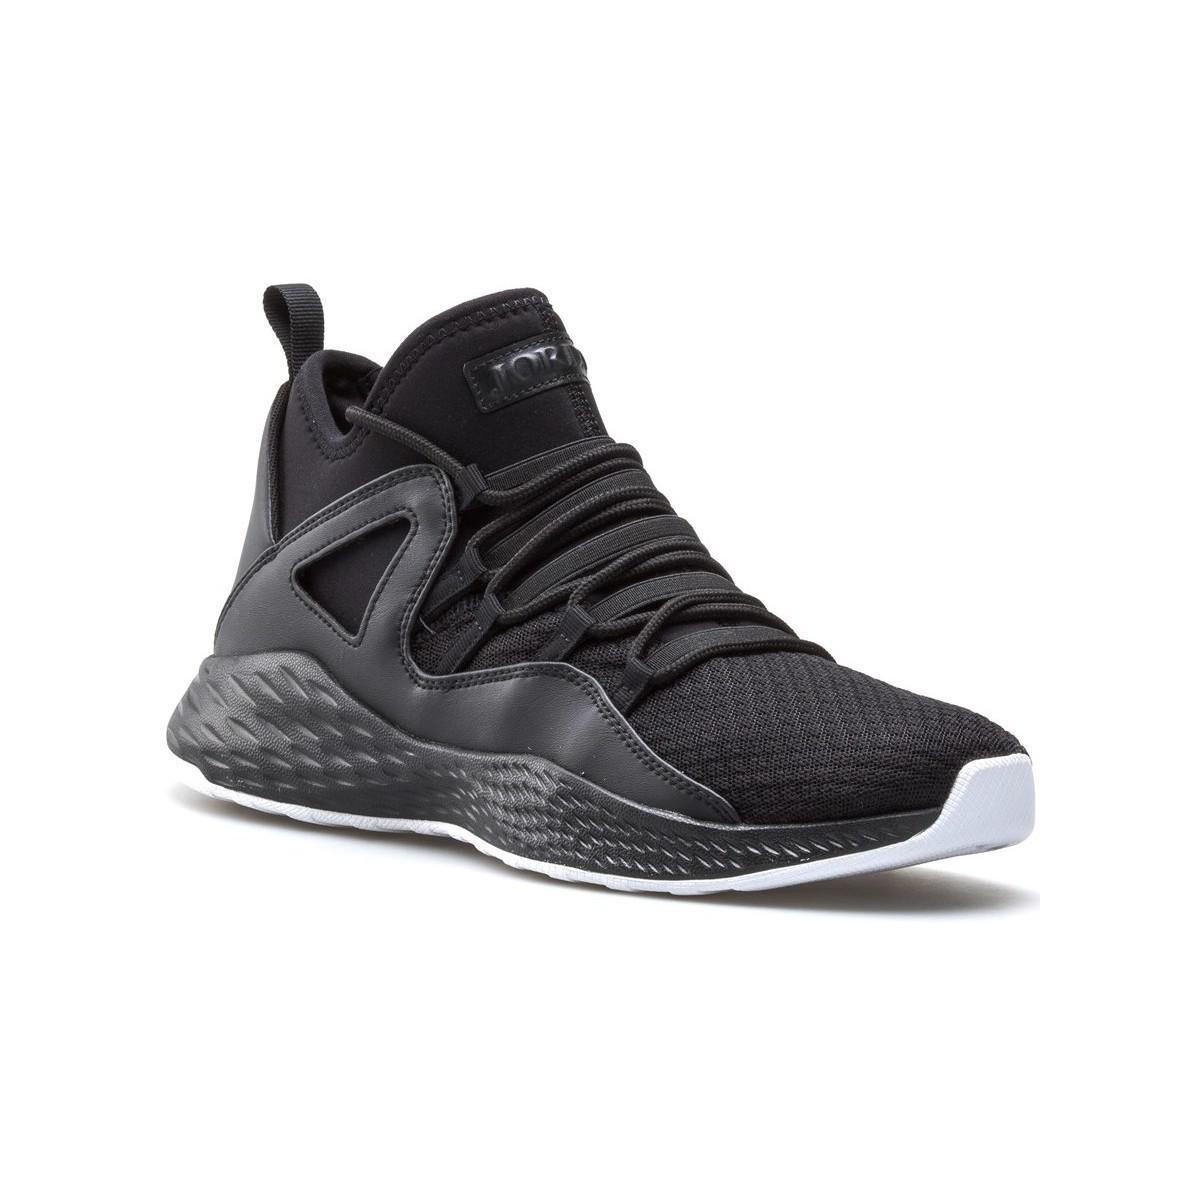 cea8e812732 Nike Jordan Formula 23 Men's Basketball Trainers (shoes) In Black in ...